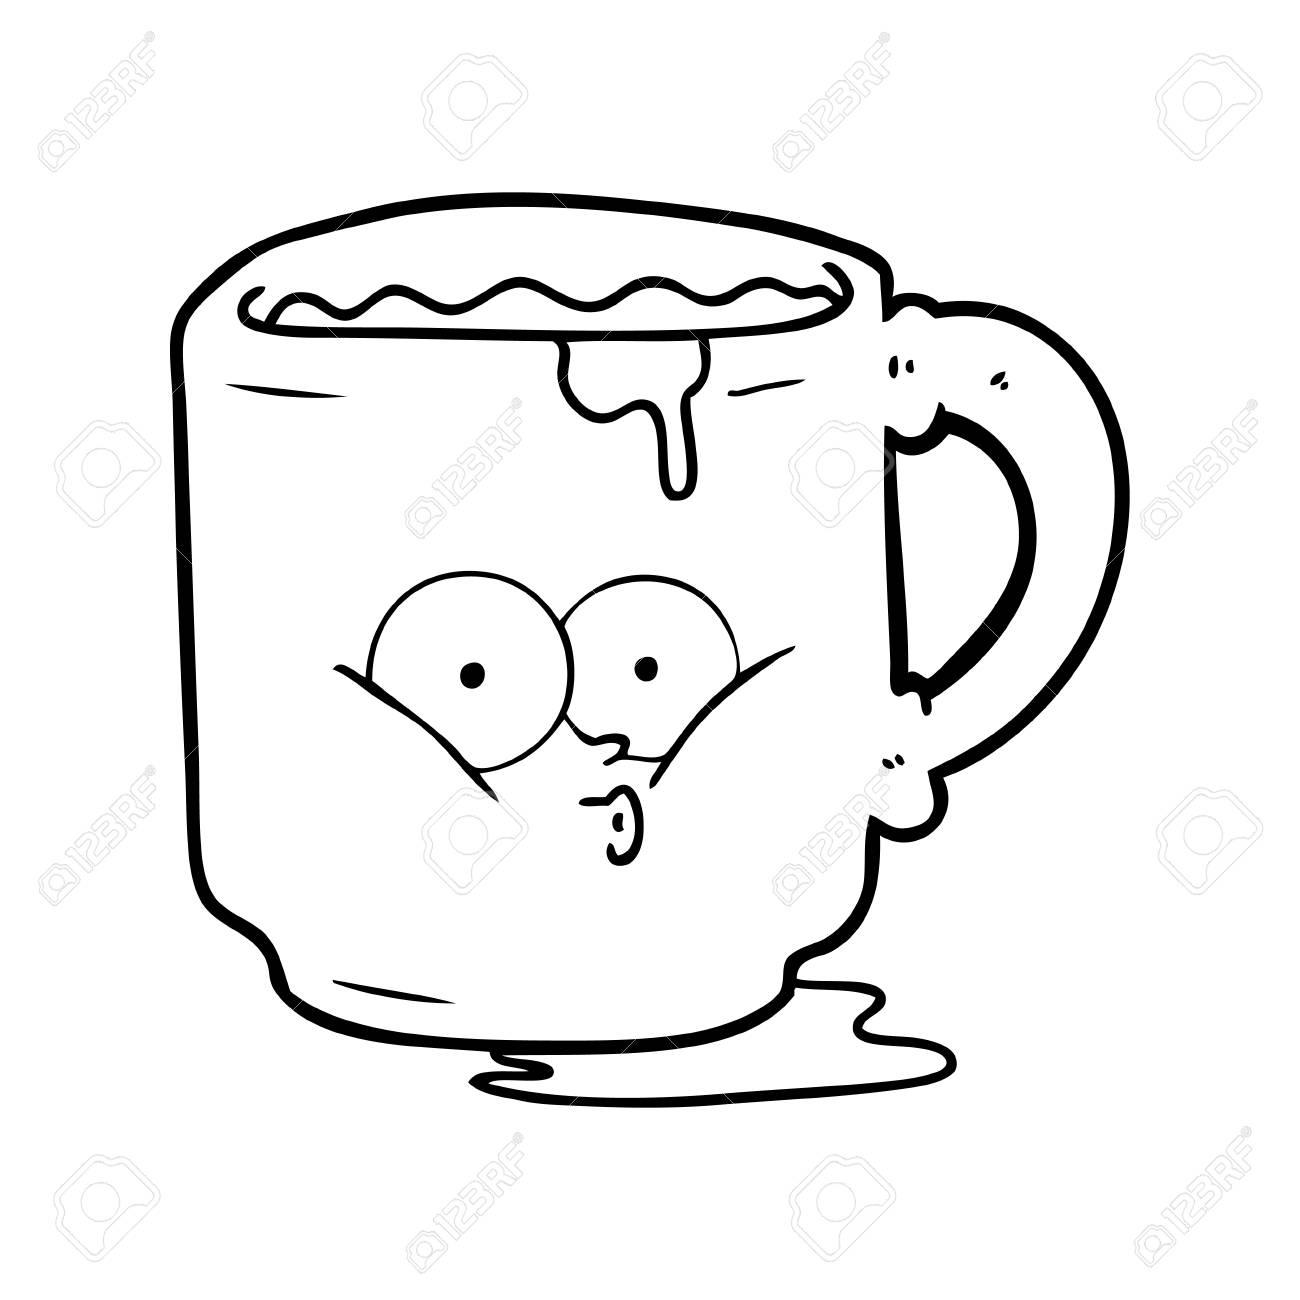 Cartoon Dirty Office Mug Royalty Free Cliparts Vectors And Stock Illustration Image 94844512